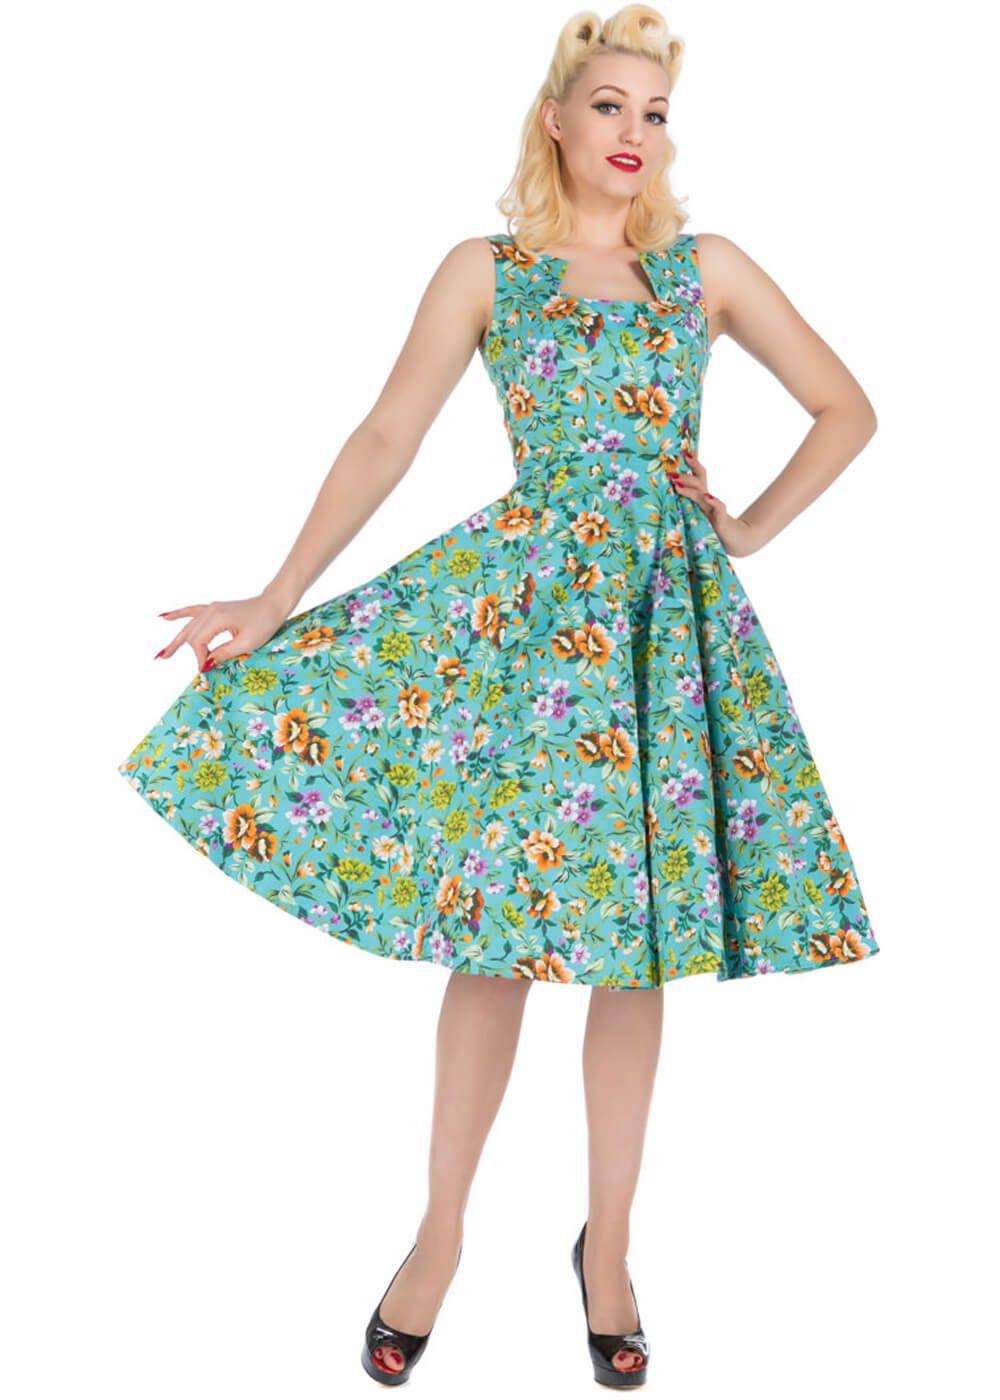 Retro Kleding.Retro Kleding Hr Karina Turquoise Floral Dress Een Bloemenjurk Die